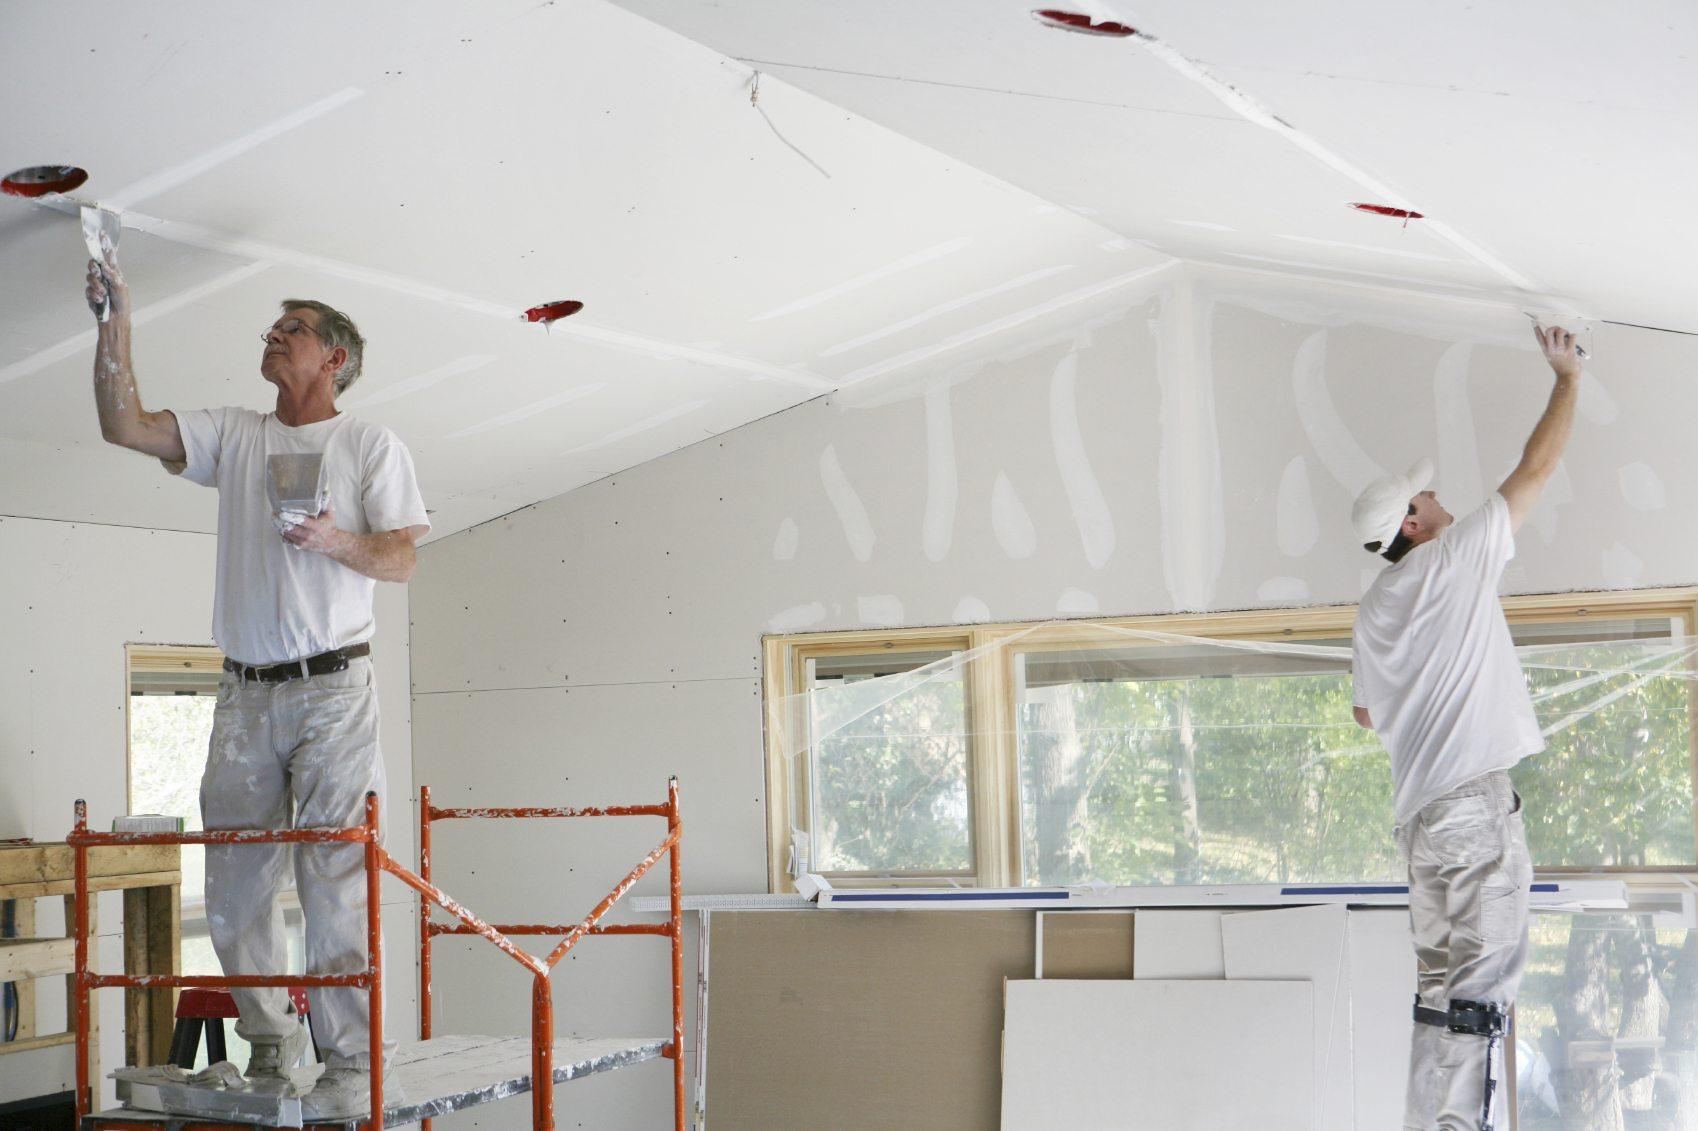 drywall repair and replacement